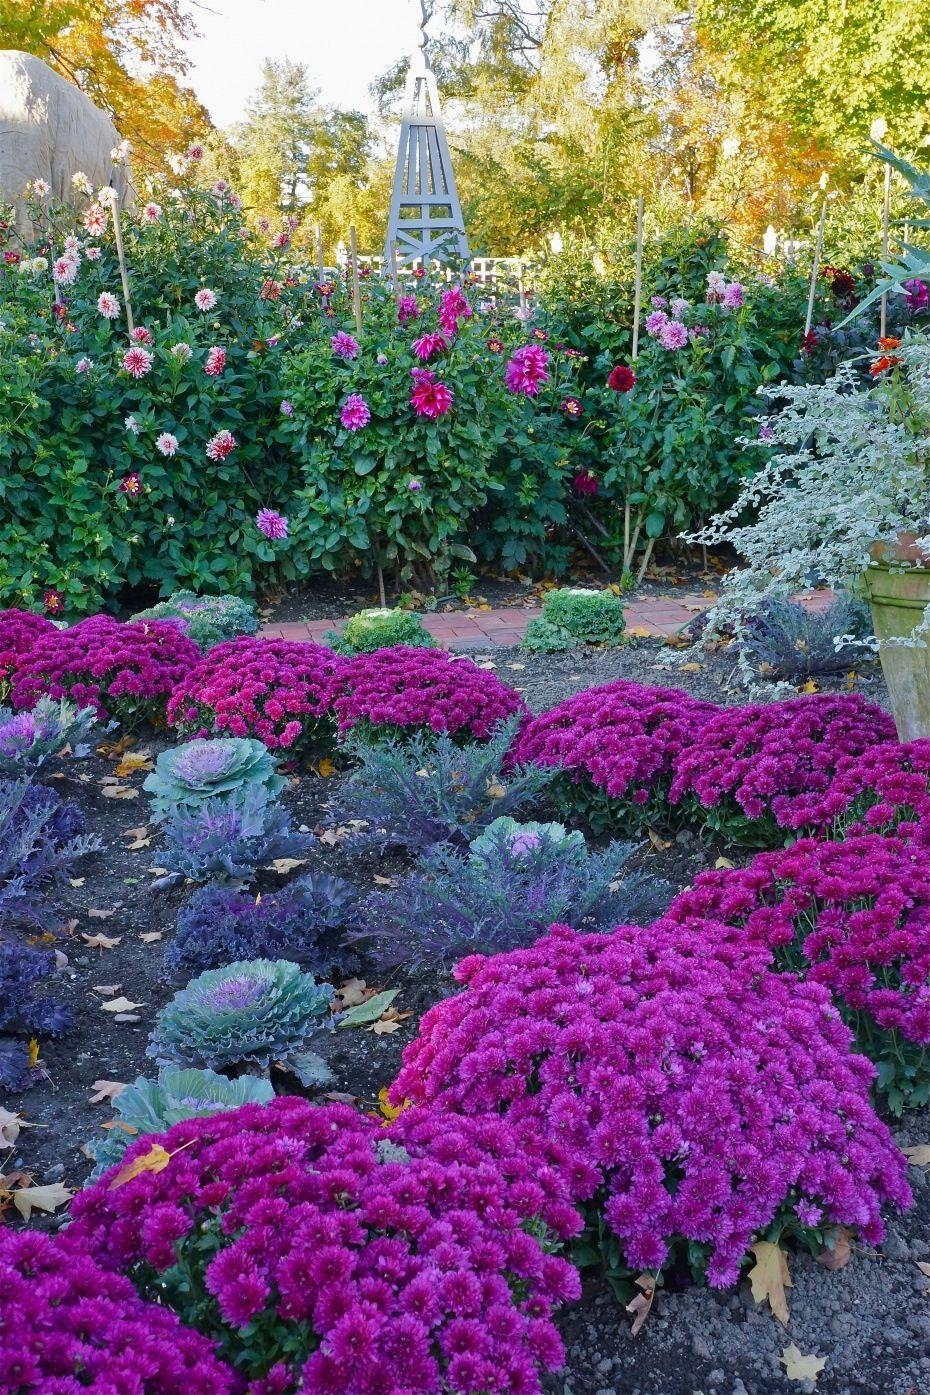 Mums Cabbage Roses Garden Pinterest